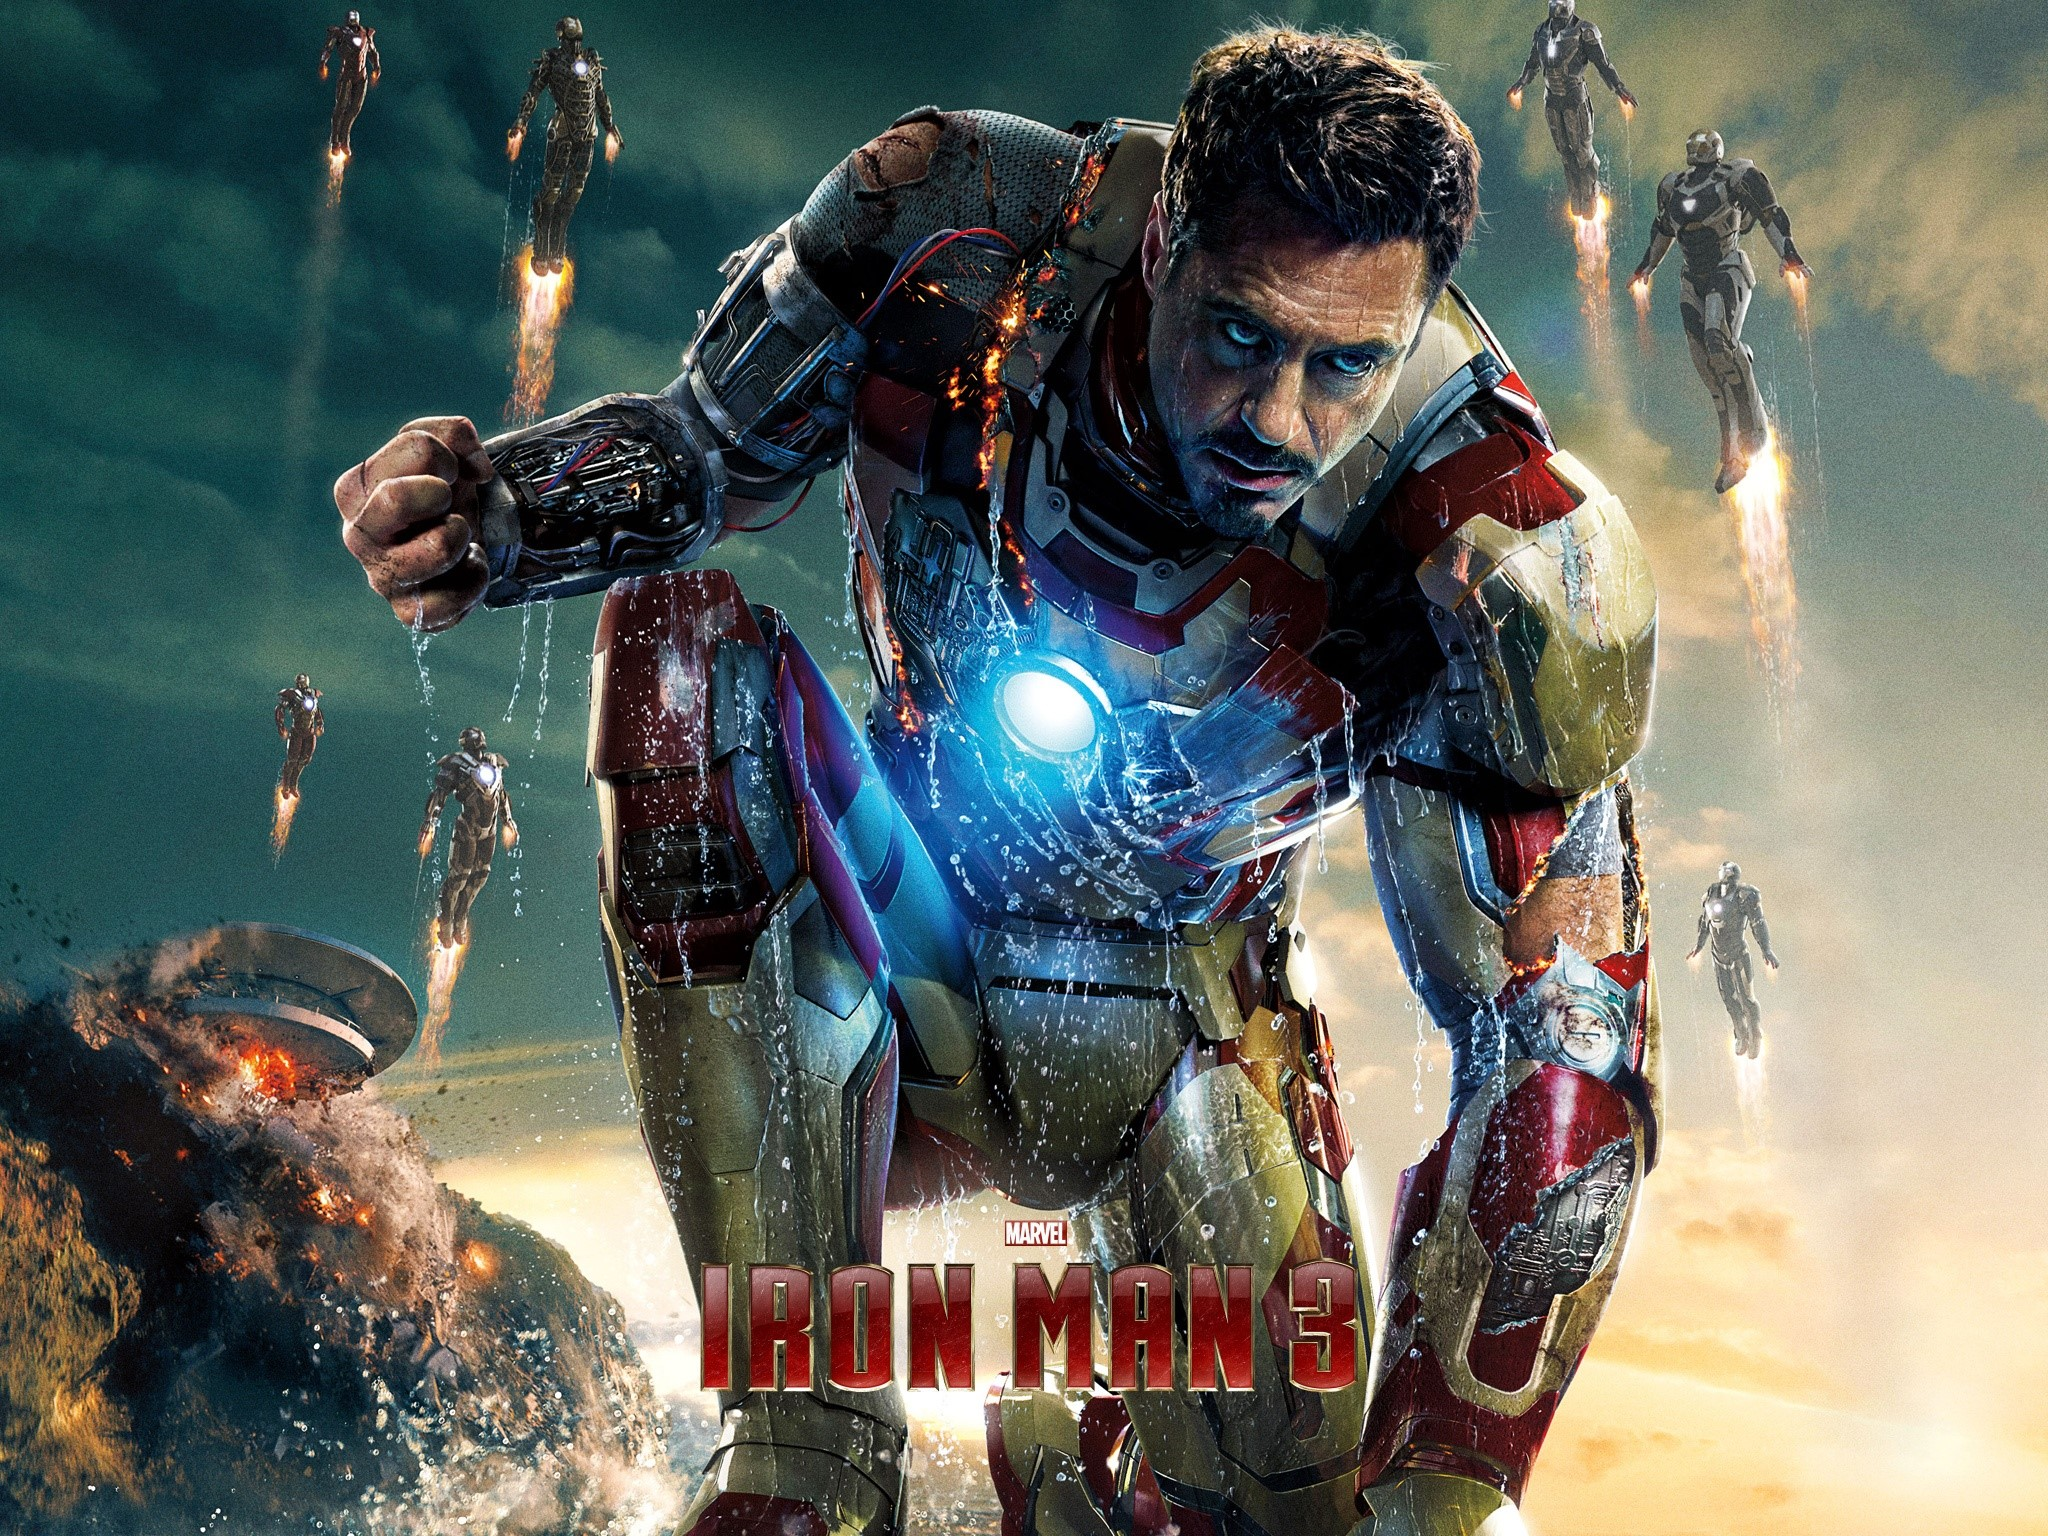 Fondos de pantalla Robert Downey Jr en Iron man 3